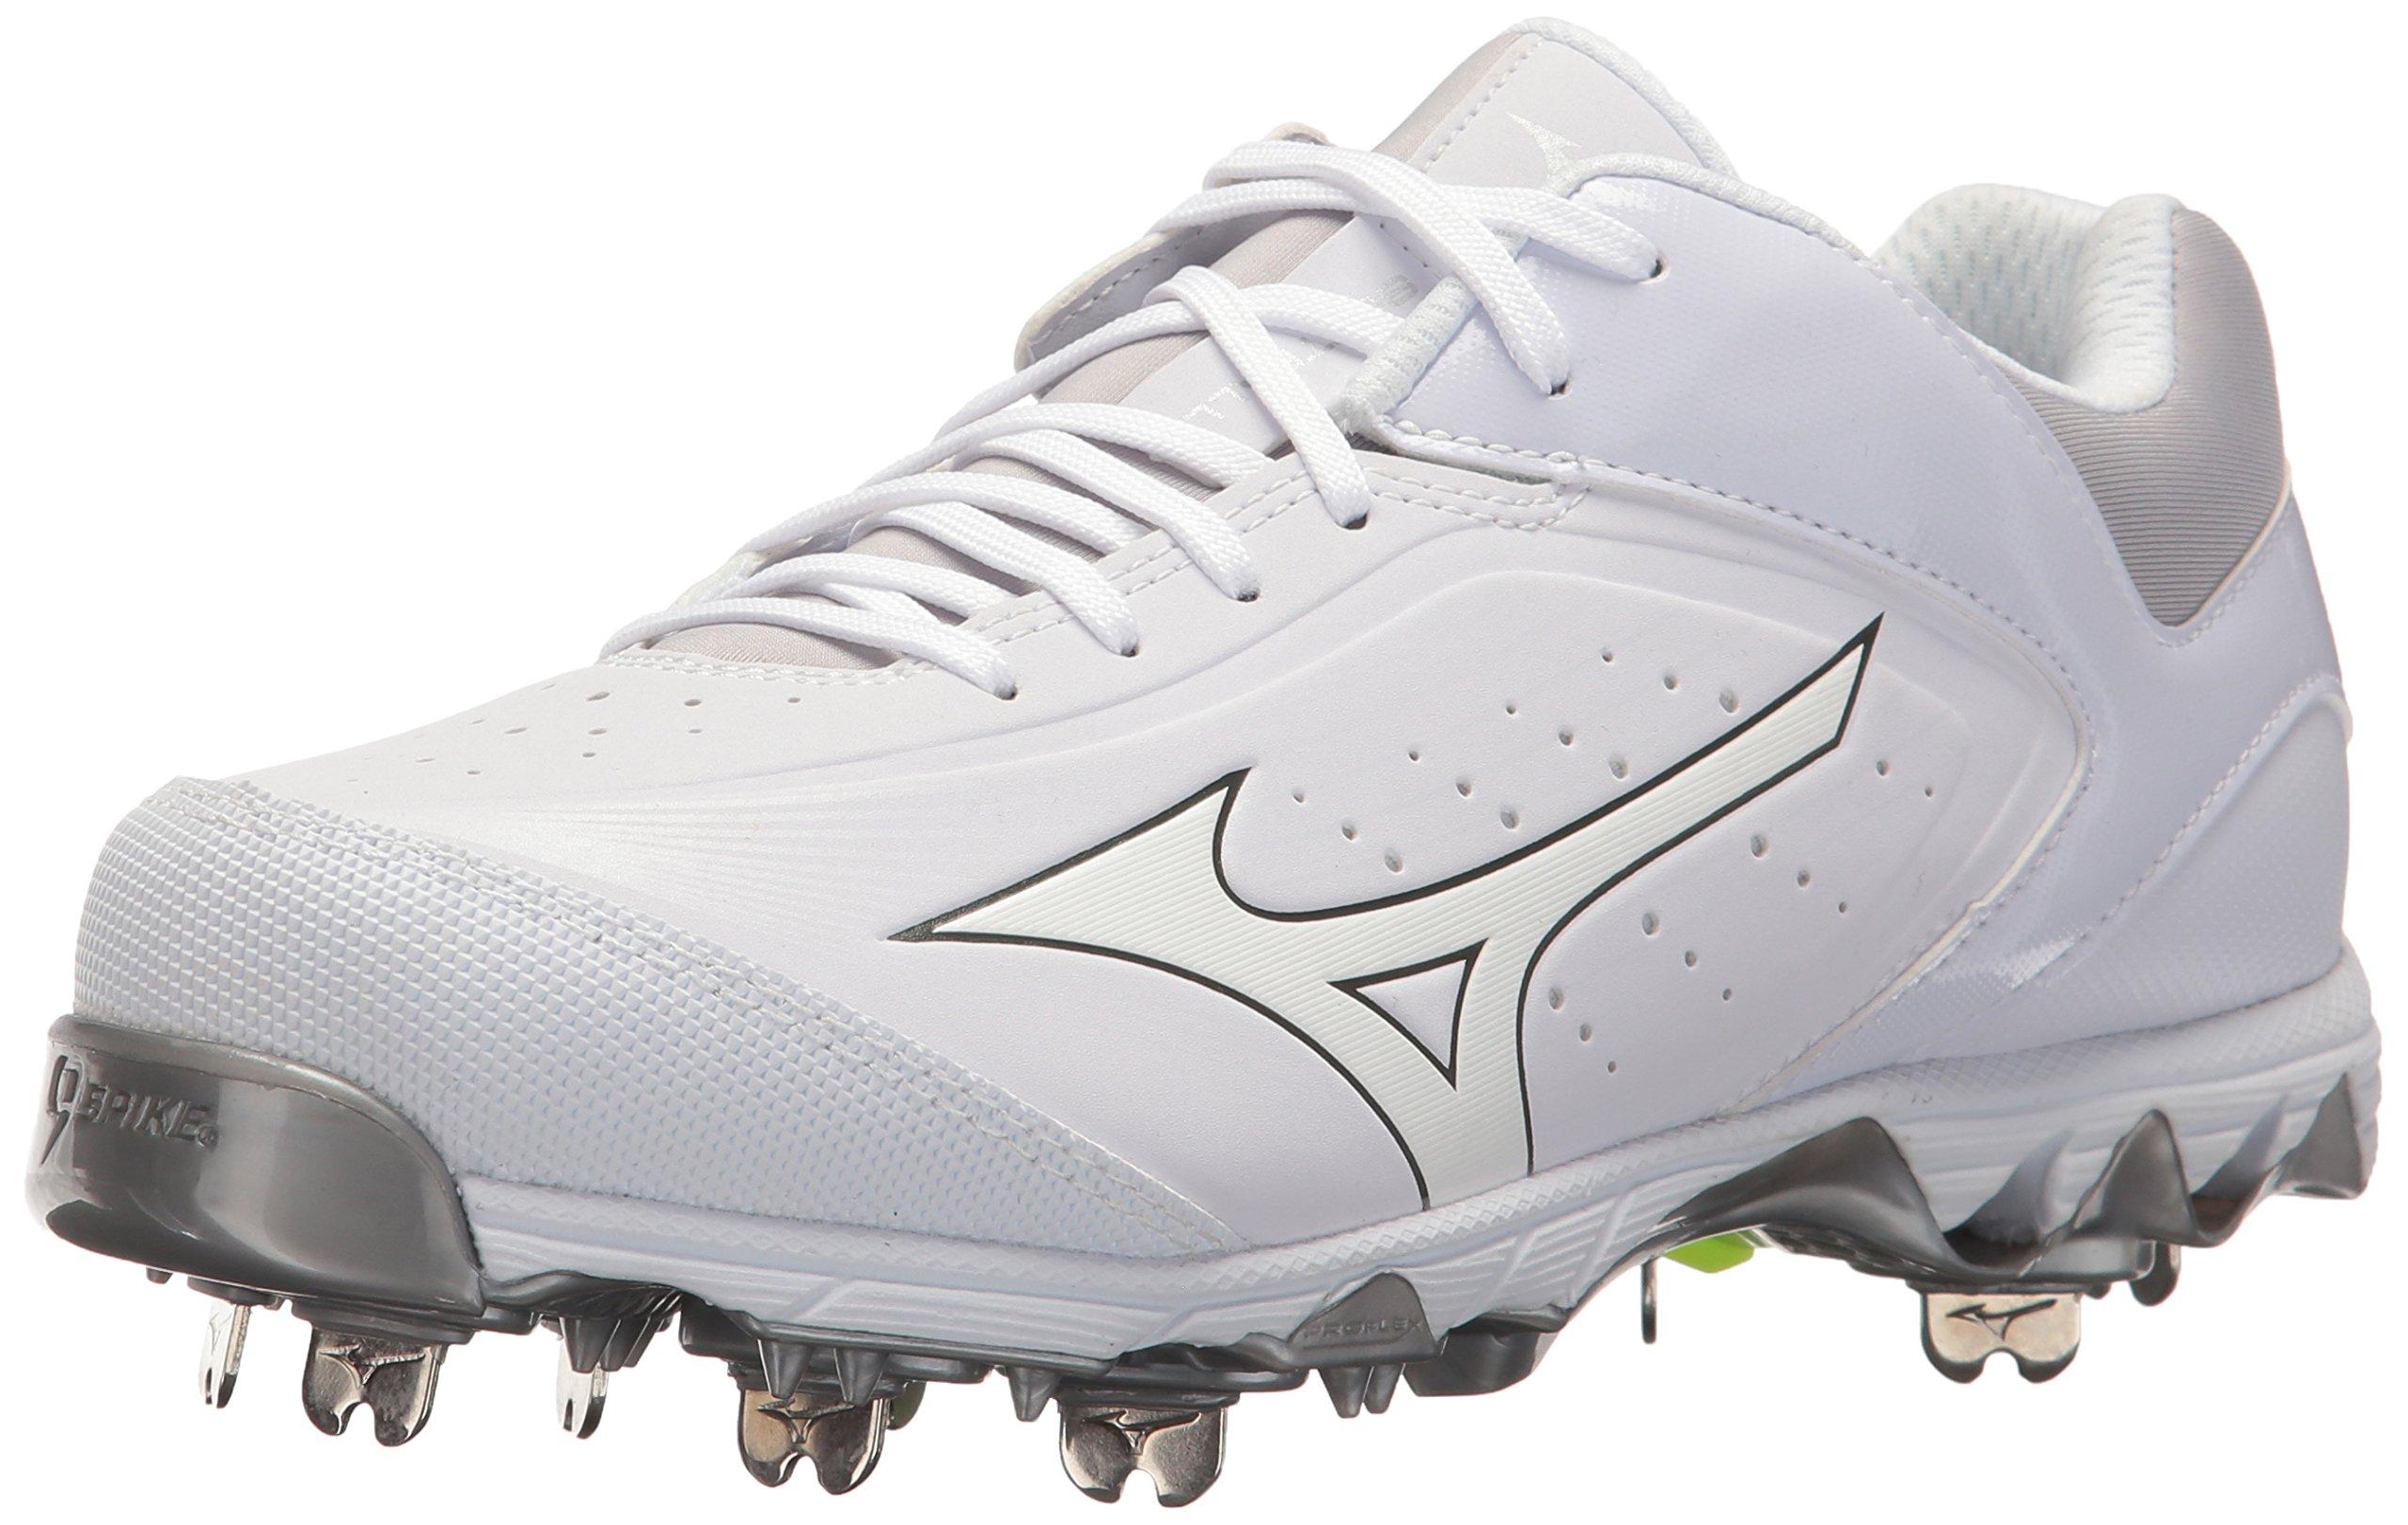 Mizuno Women's Swift 5 Fastpitch Cleat Softball Shoe, White/White, 8 B US by Mizuno